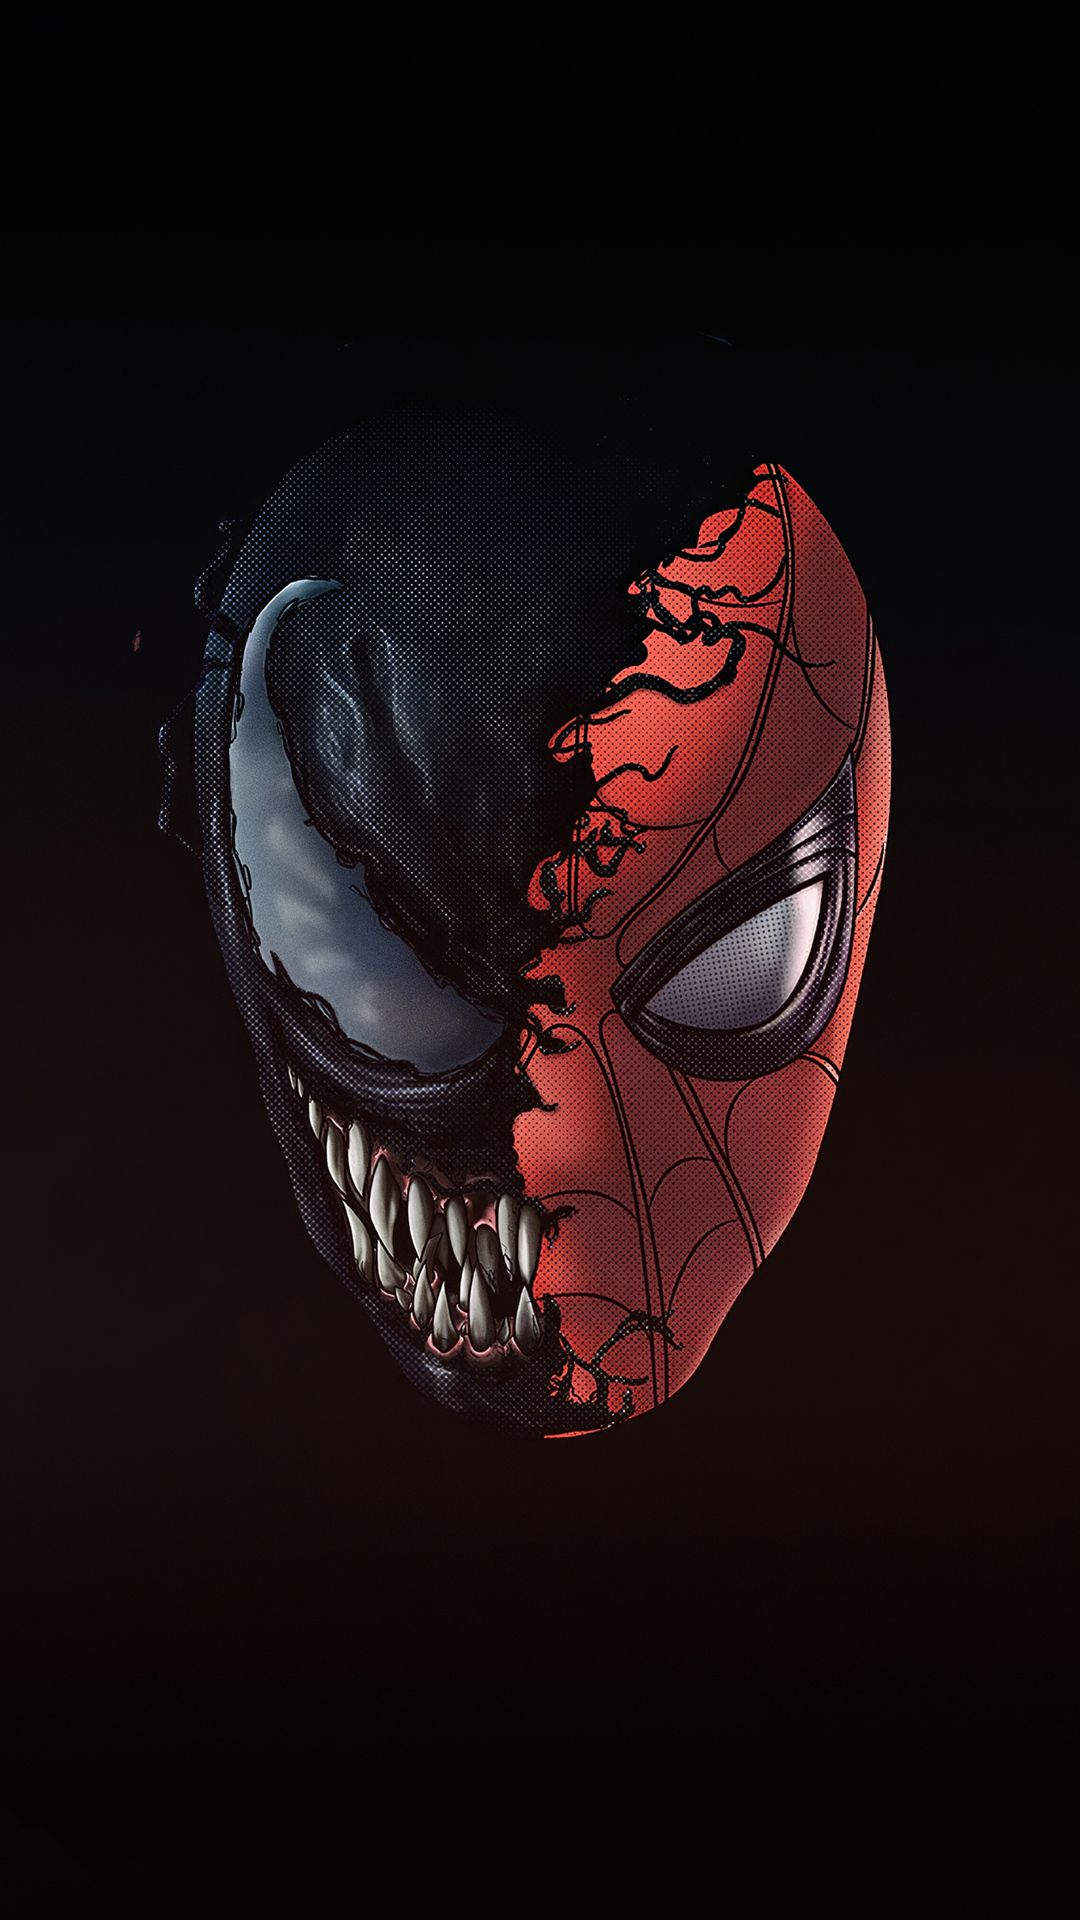 Spiderman x venom Mobile Wallpaper in 2020 Iphone wallpaper